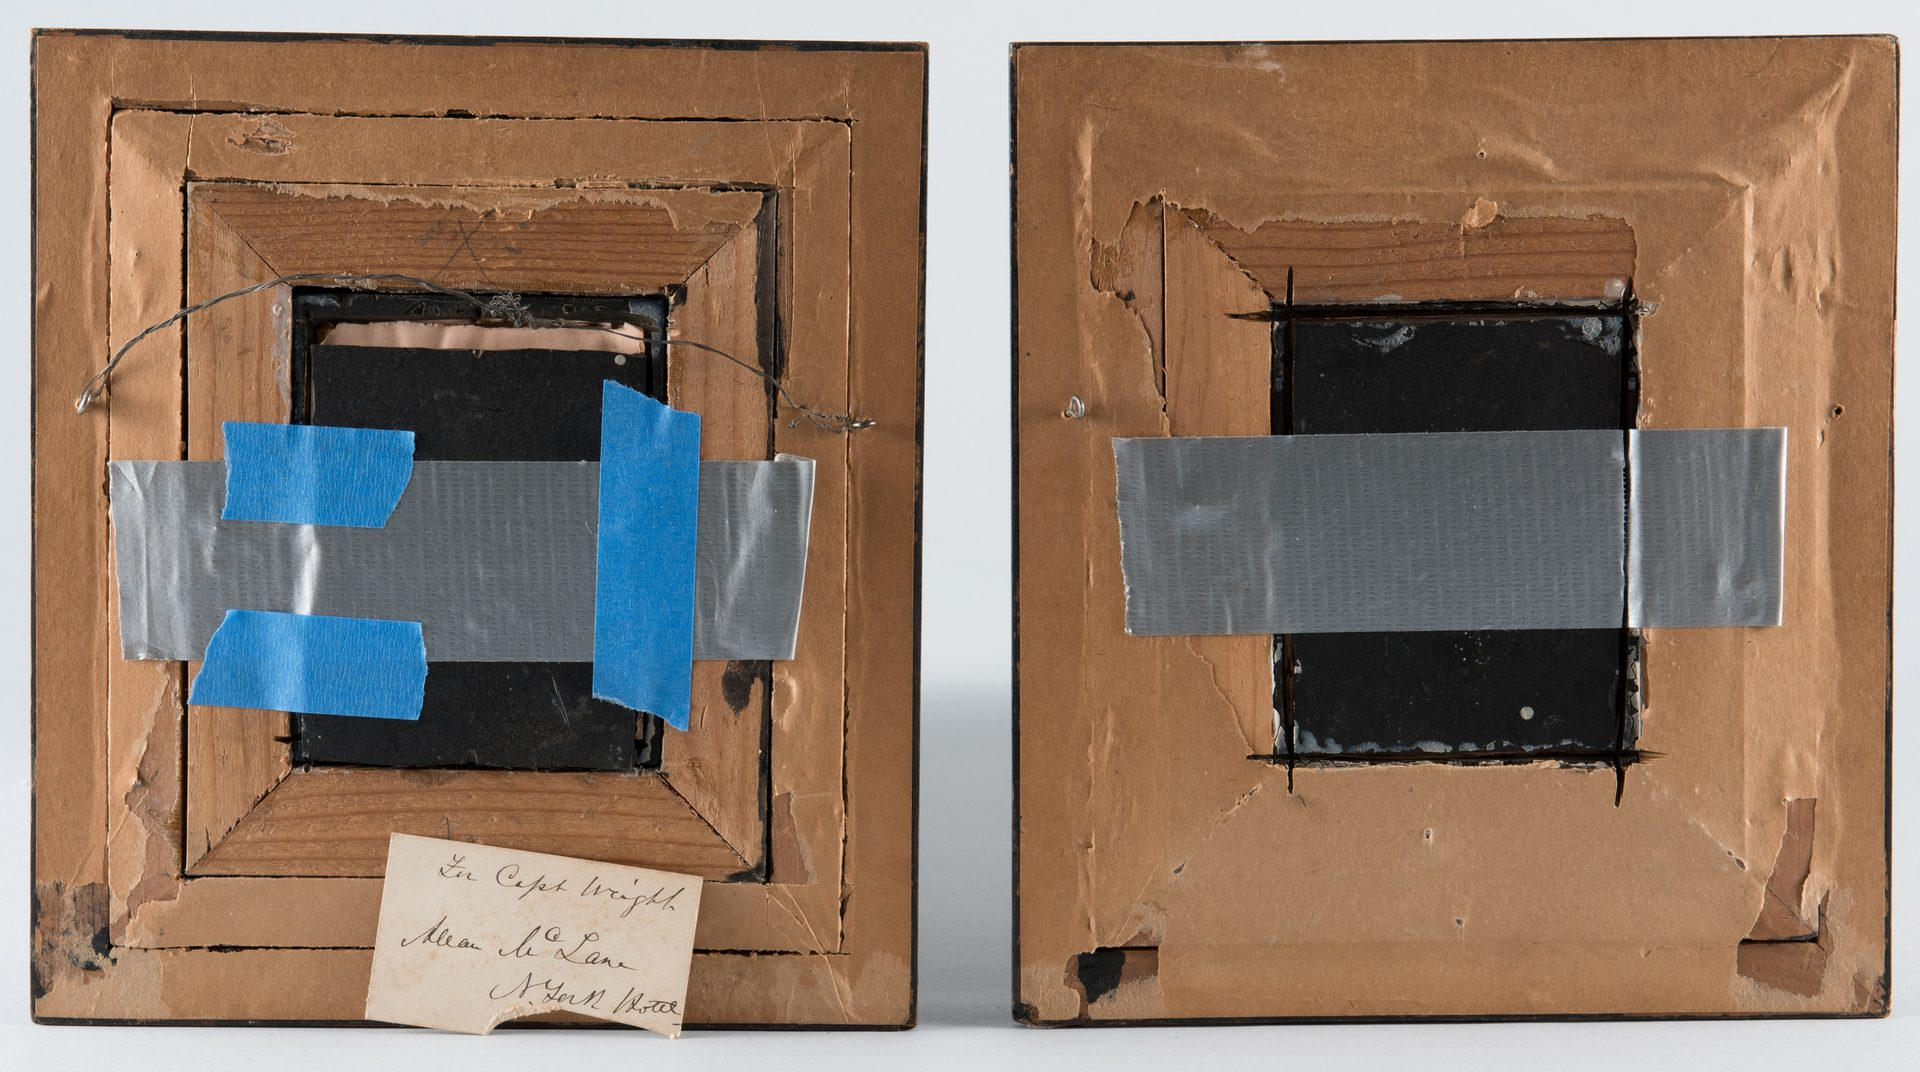 Lot 286: 2 miniature portraits related to Capt. Allen McLane